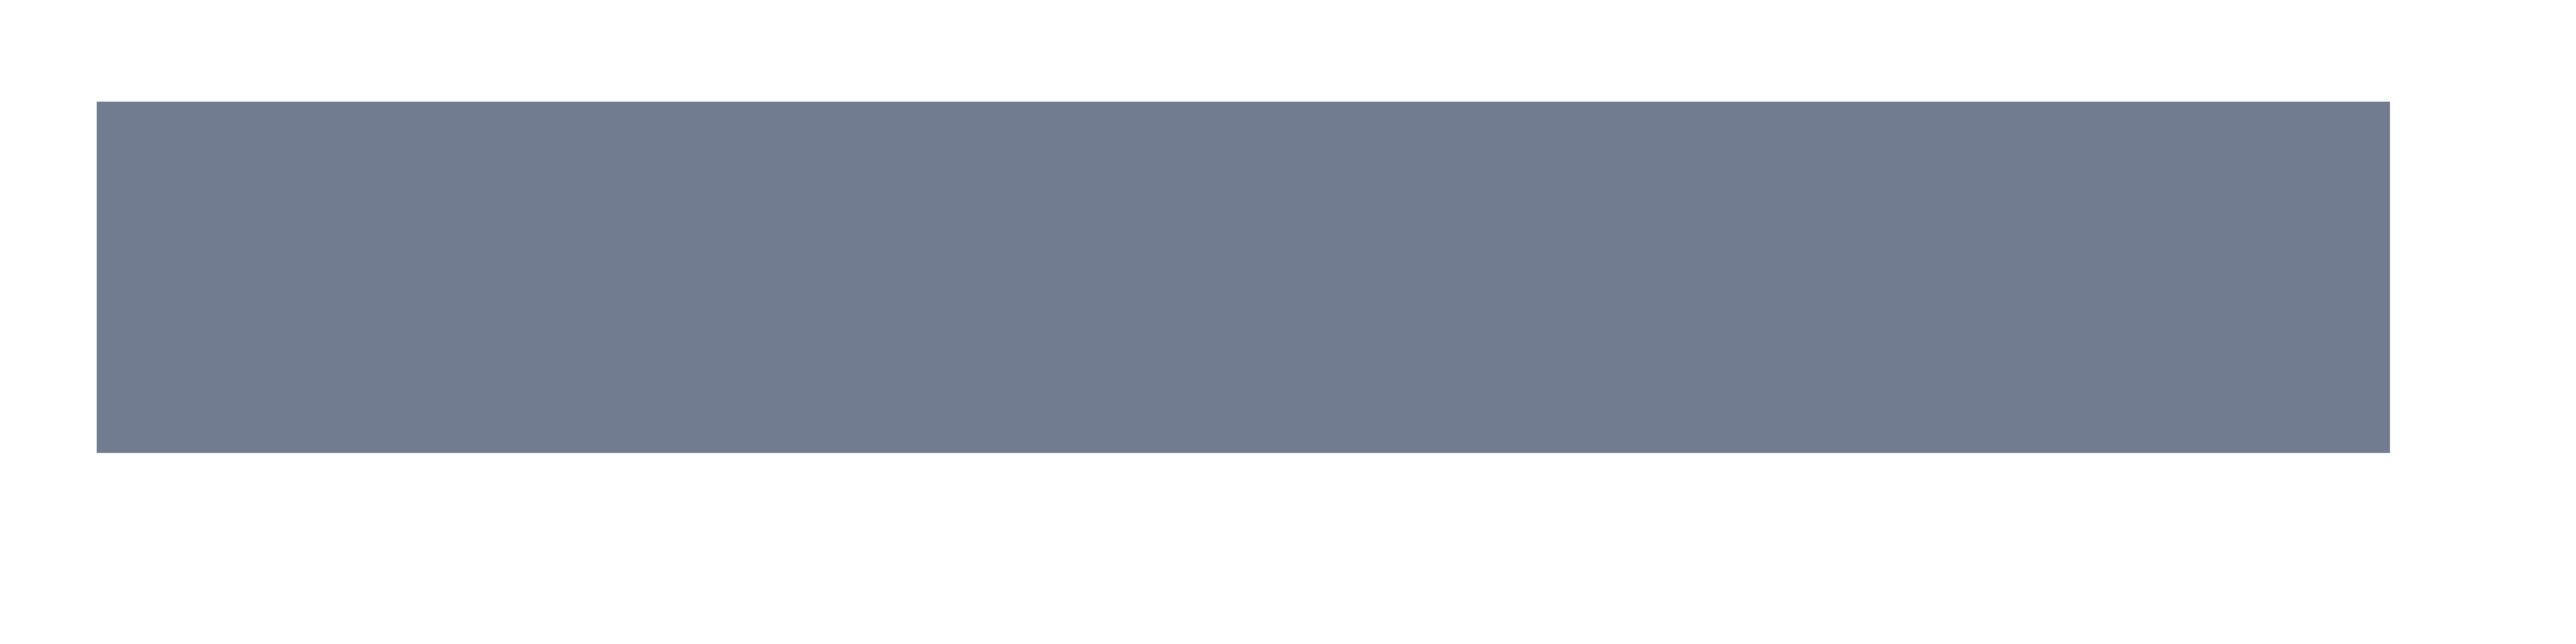 nacoffee logo